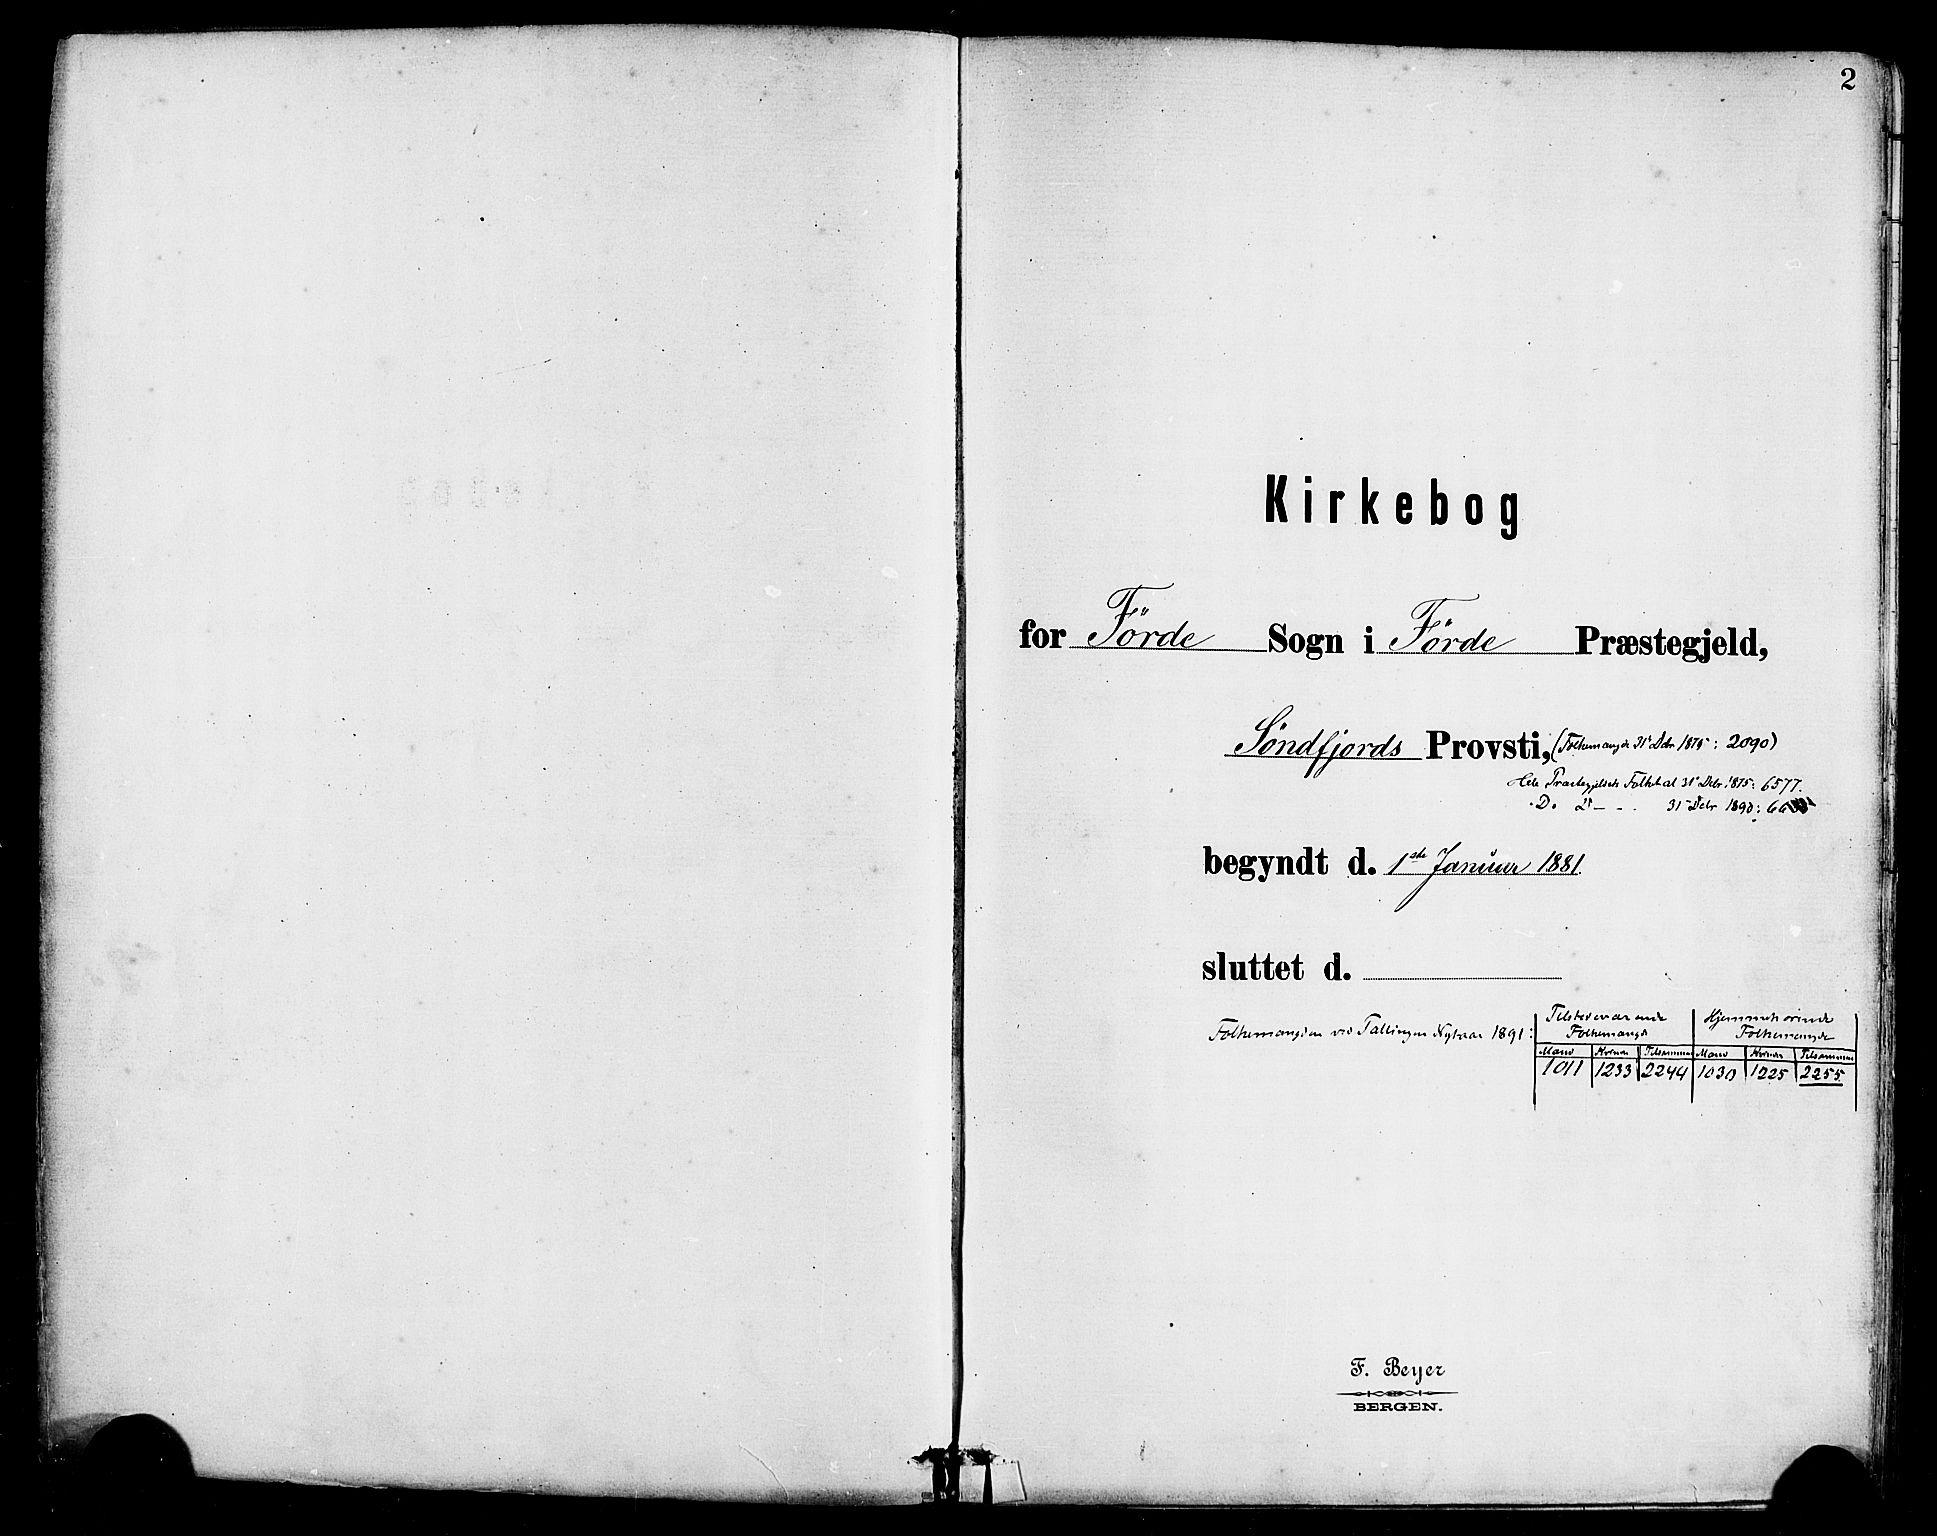 SAB, Førde Sokneprestembete, H/Haa: Ministerialbok nr. B 1, 1880-1898, s. 2